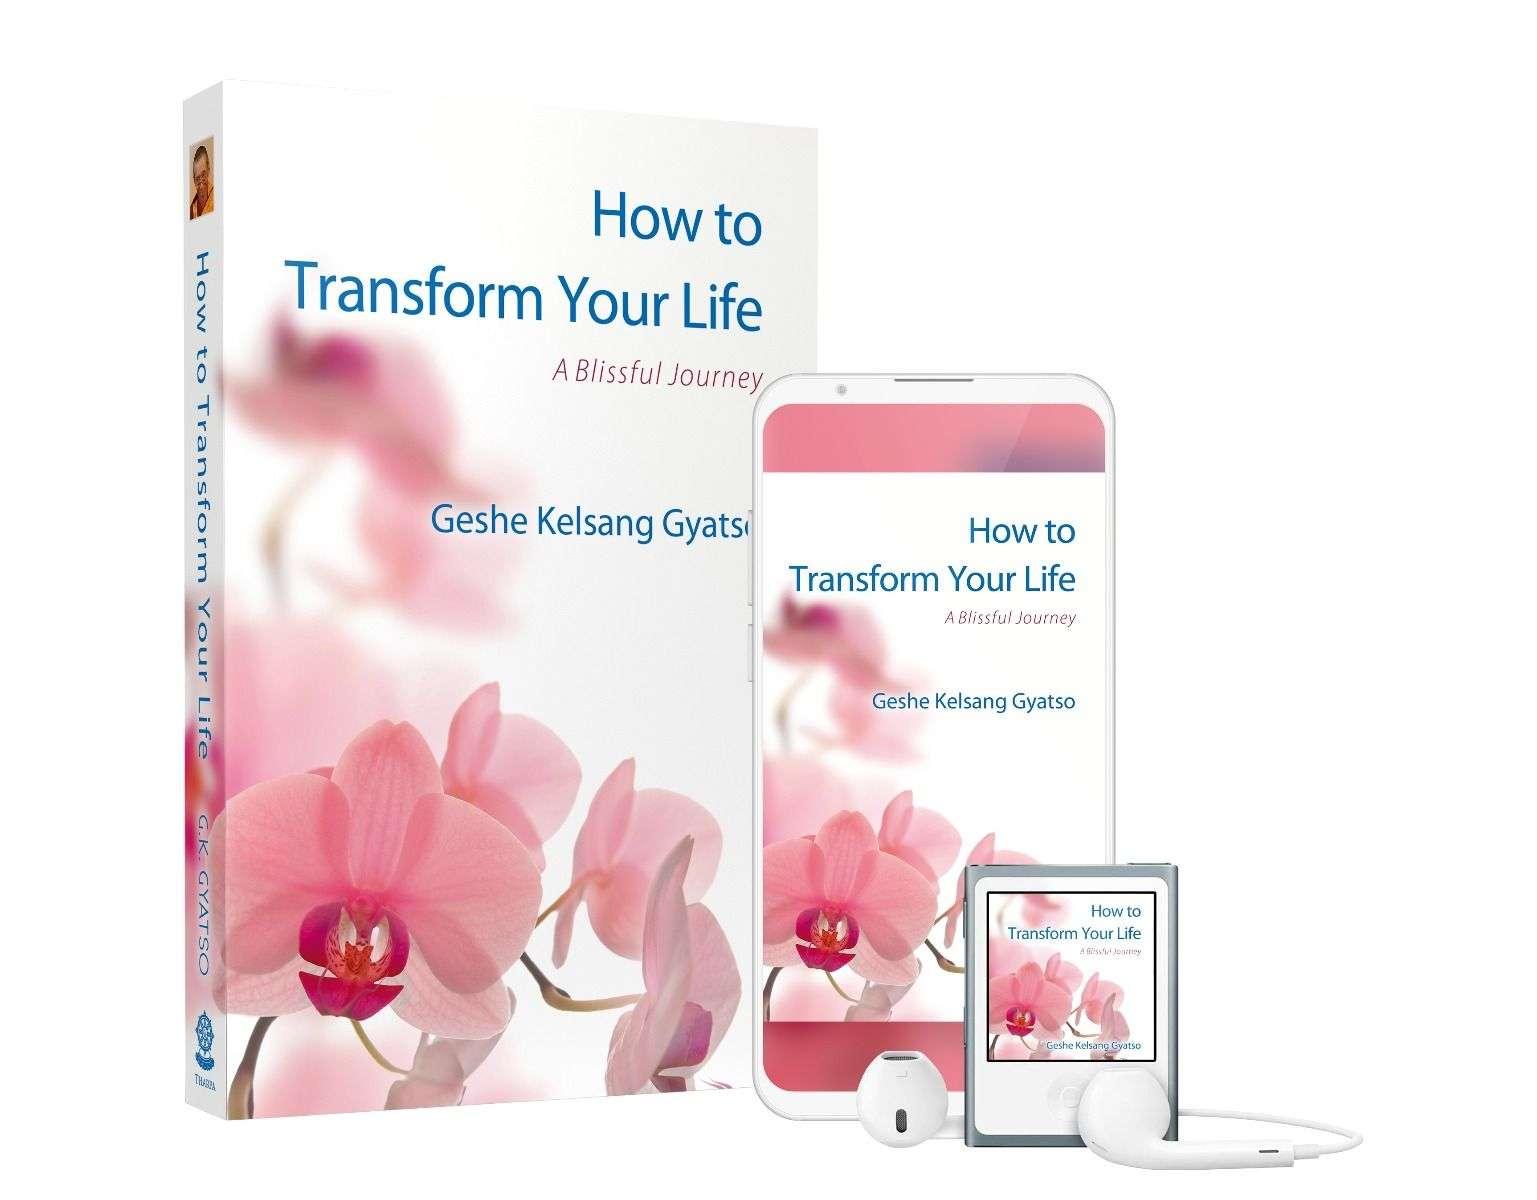 https://tharpa.com/ca/how-to-transform-your-life.html